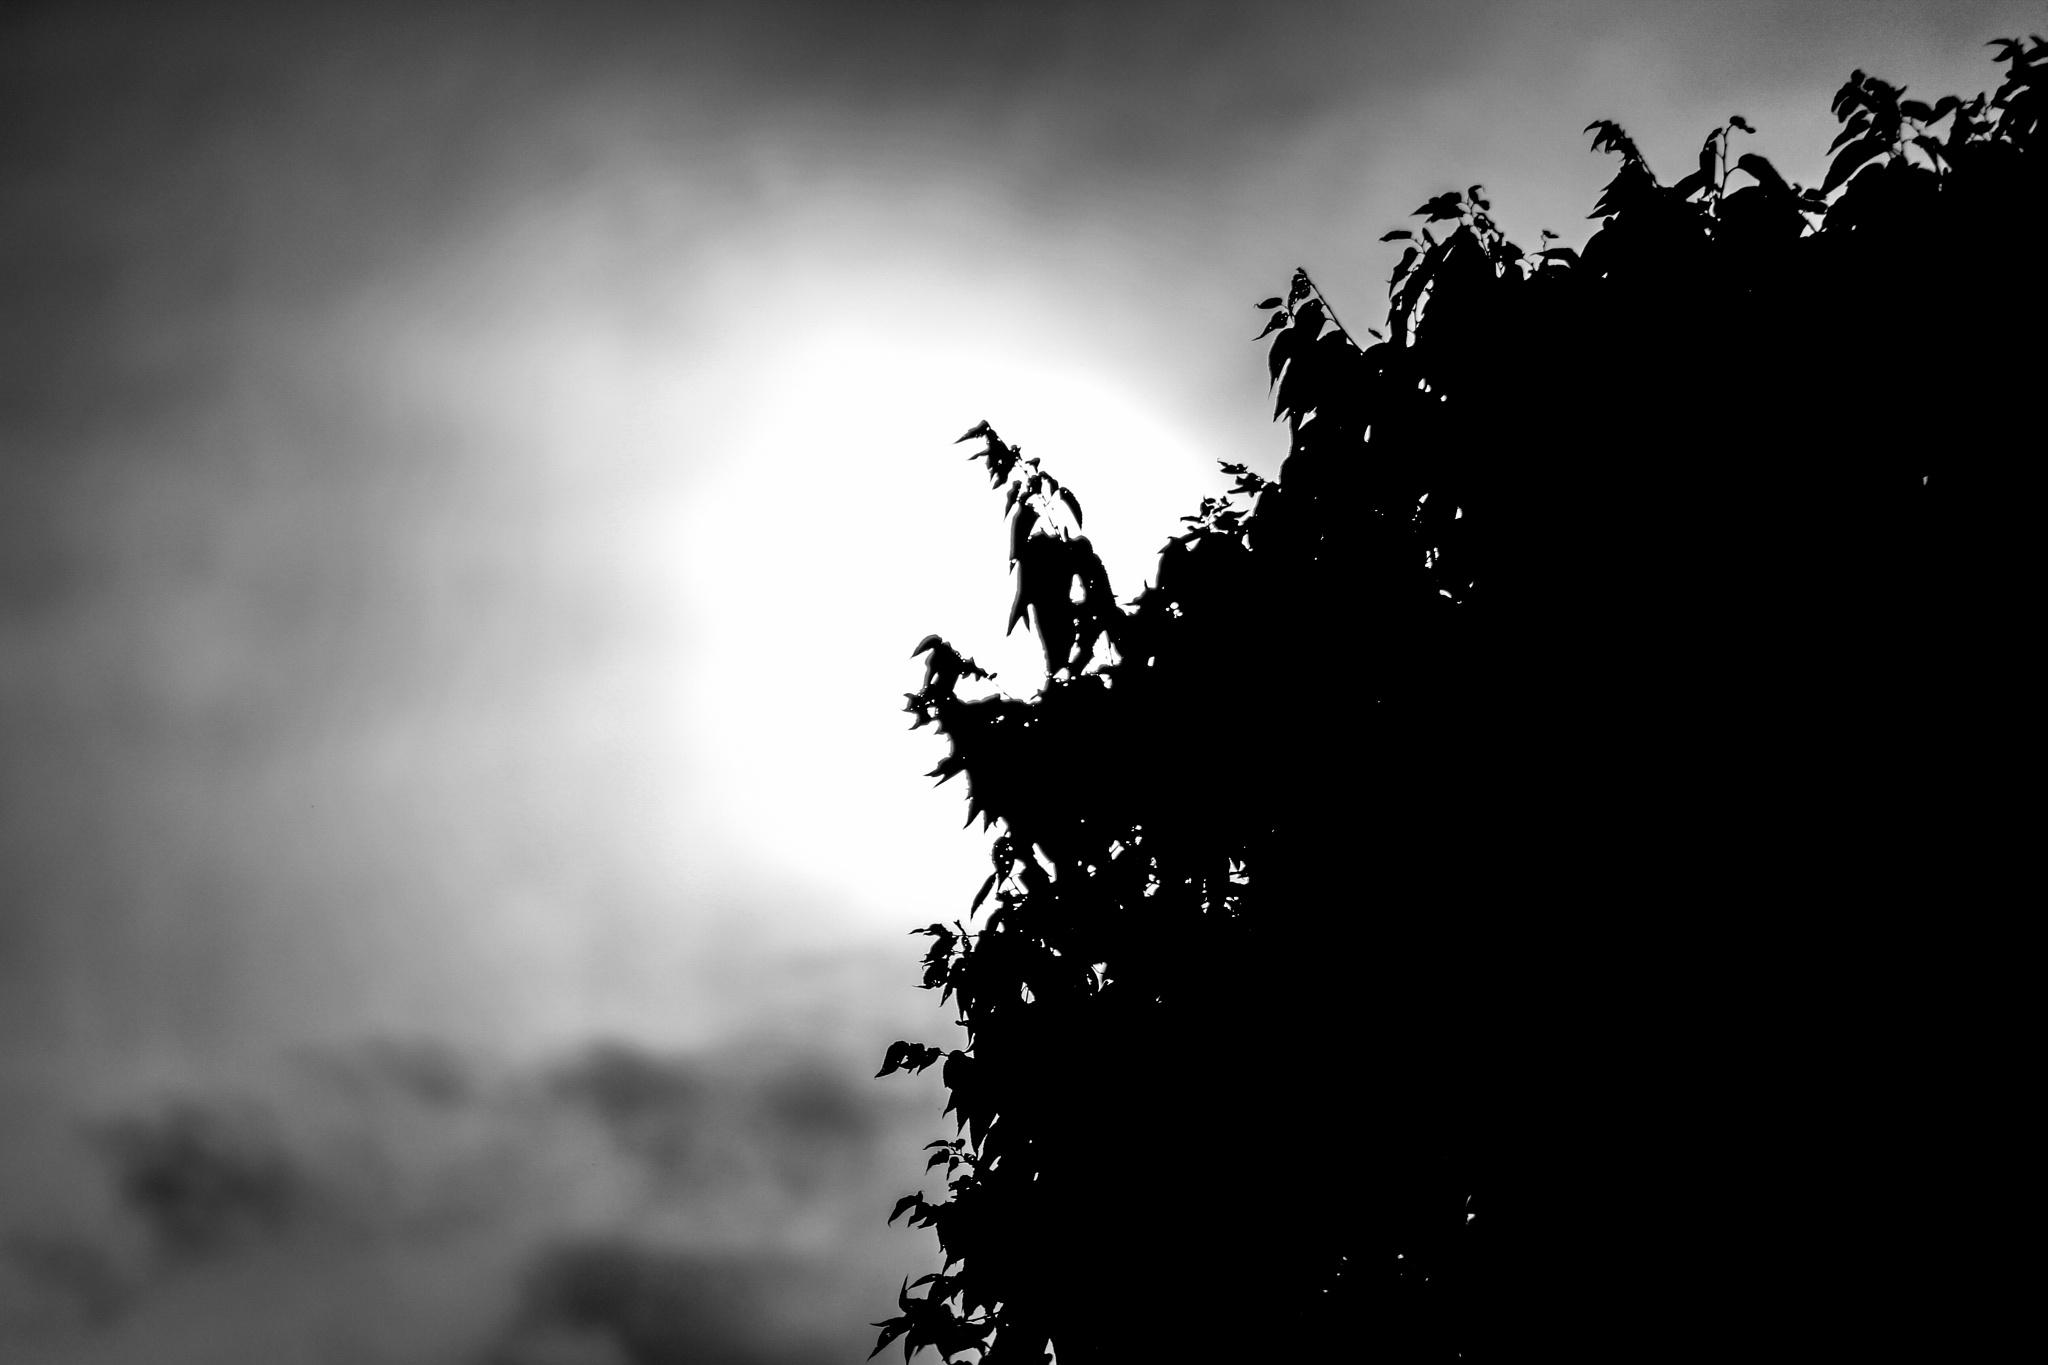 B/W Sunset by Johnny K